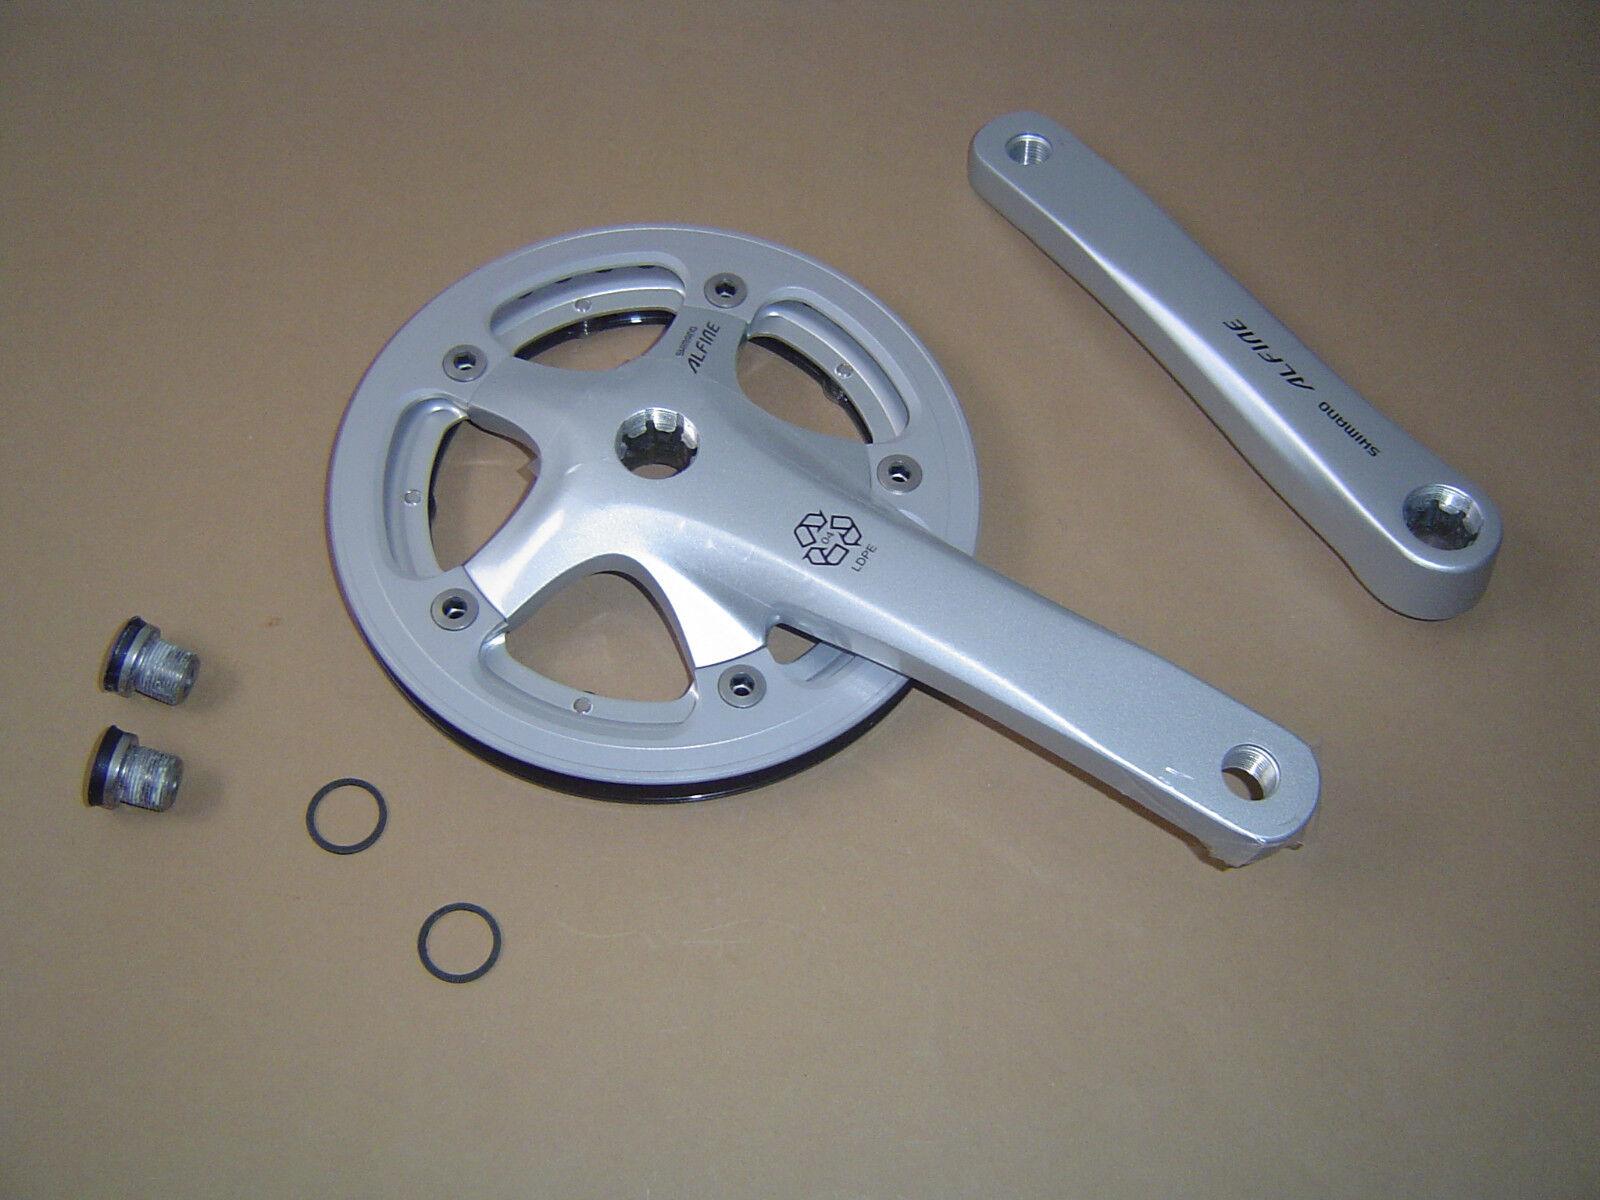 Shimano Shimano Shimano Alfine FC-S400 Kurbelgarnitur 170mm Silber mit incl.Kurbelschrauben Neu 92aaa9